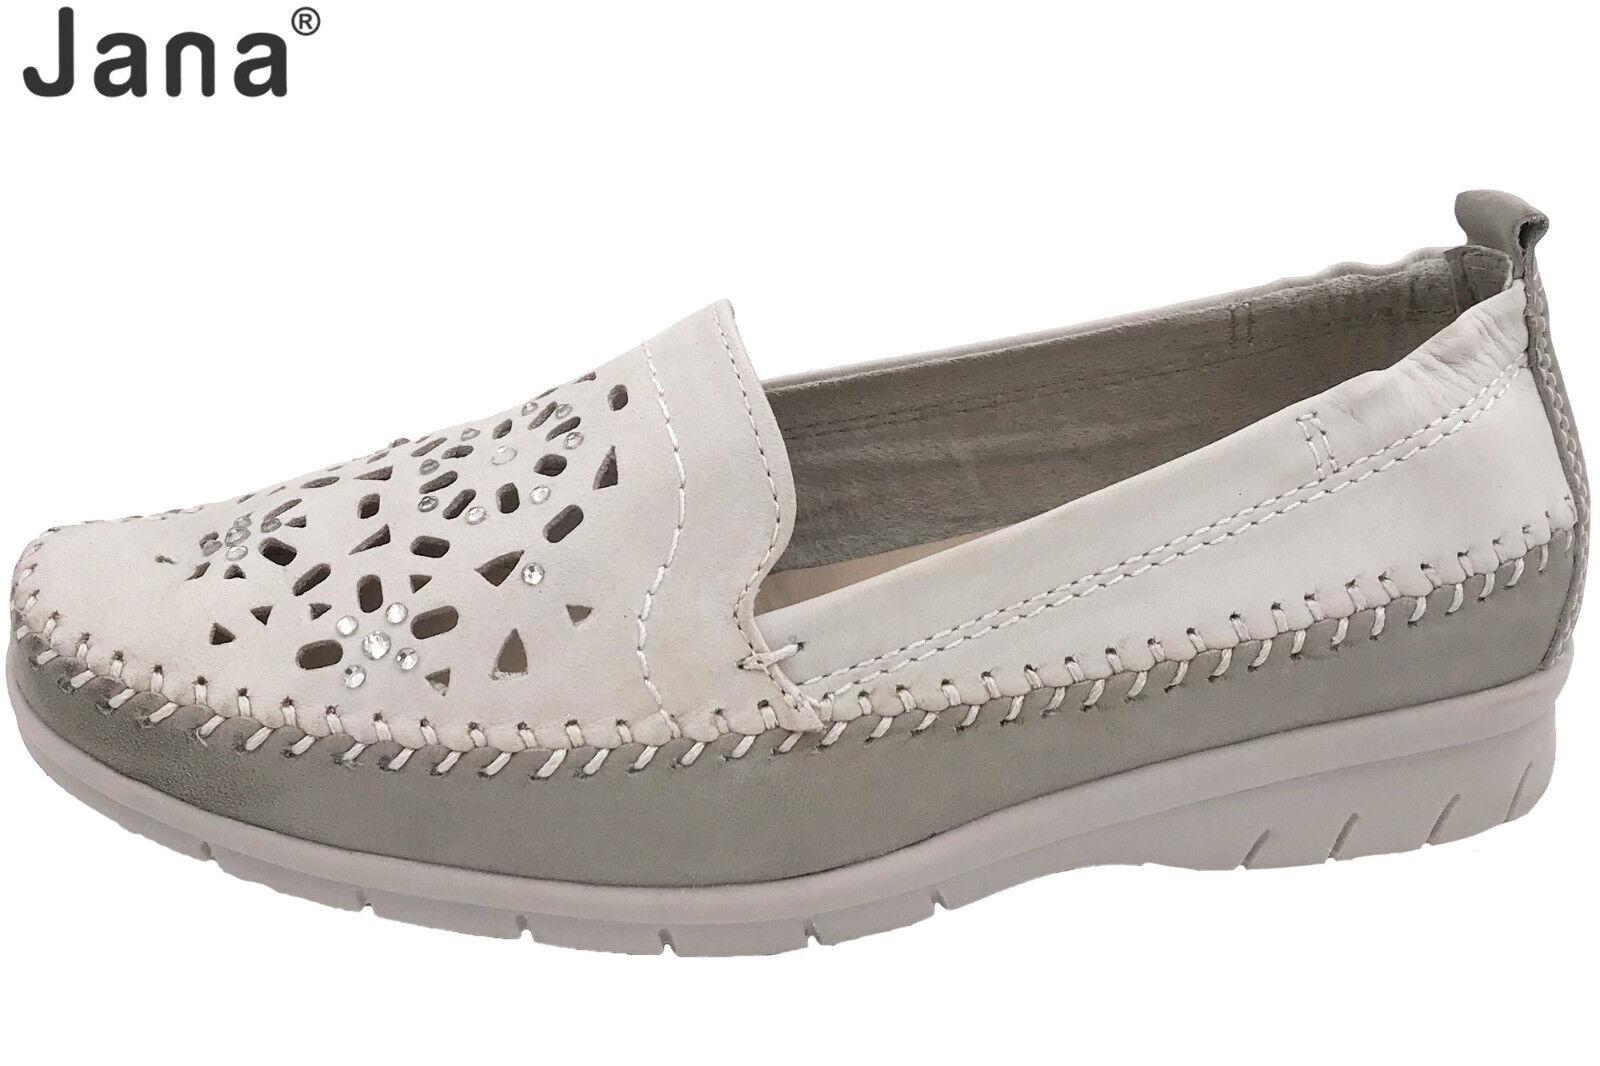 Jana Damen Leder Slipper Weiß OffWeiß Leder Damen Schuhe lose Einlage NEU 88-24615-20-190 5720e6